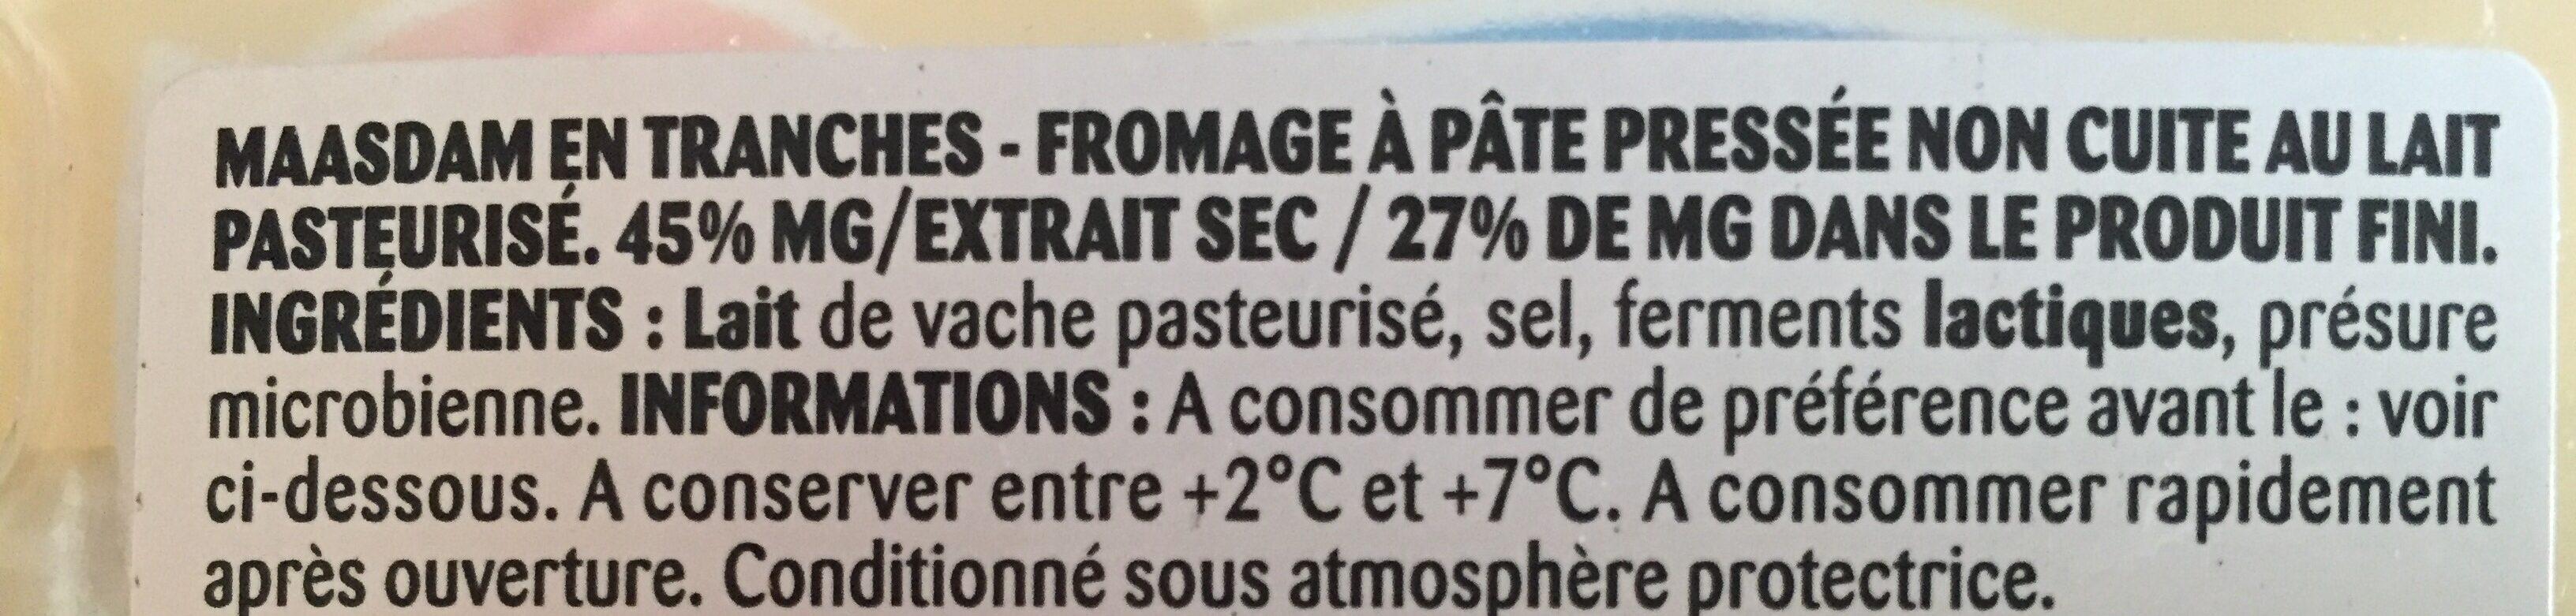 Massdam tranchette - Ingredients - fr